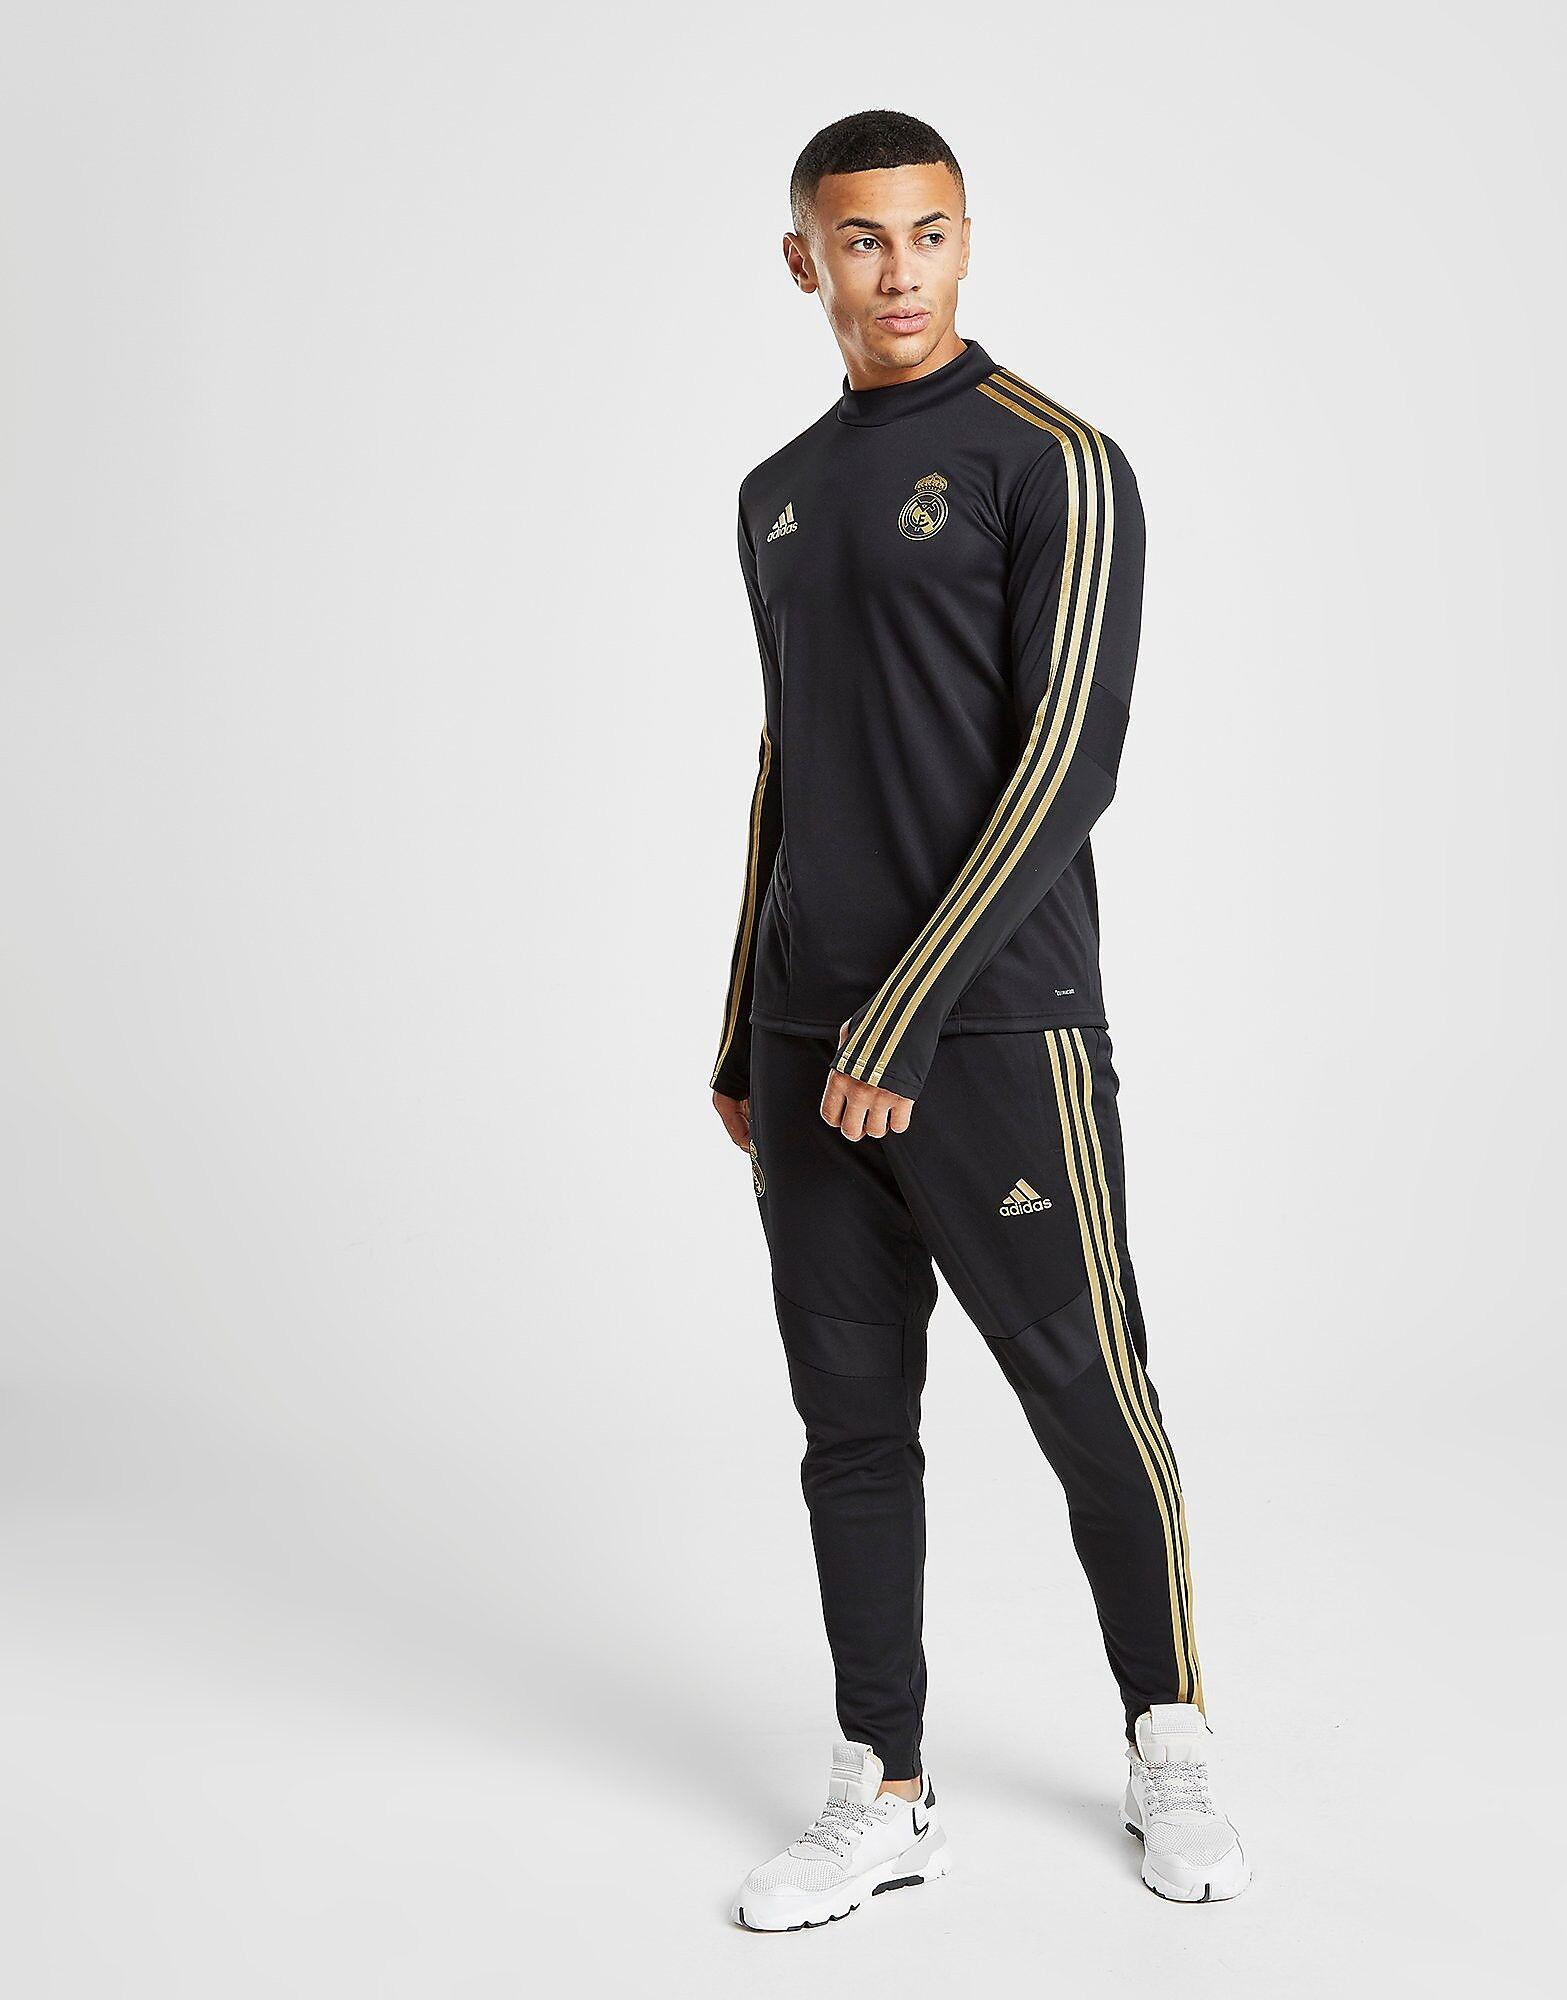 Image of Adidas Real Madrid Treenihousut Miehet - Mens, Musta